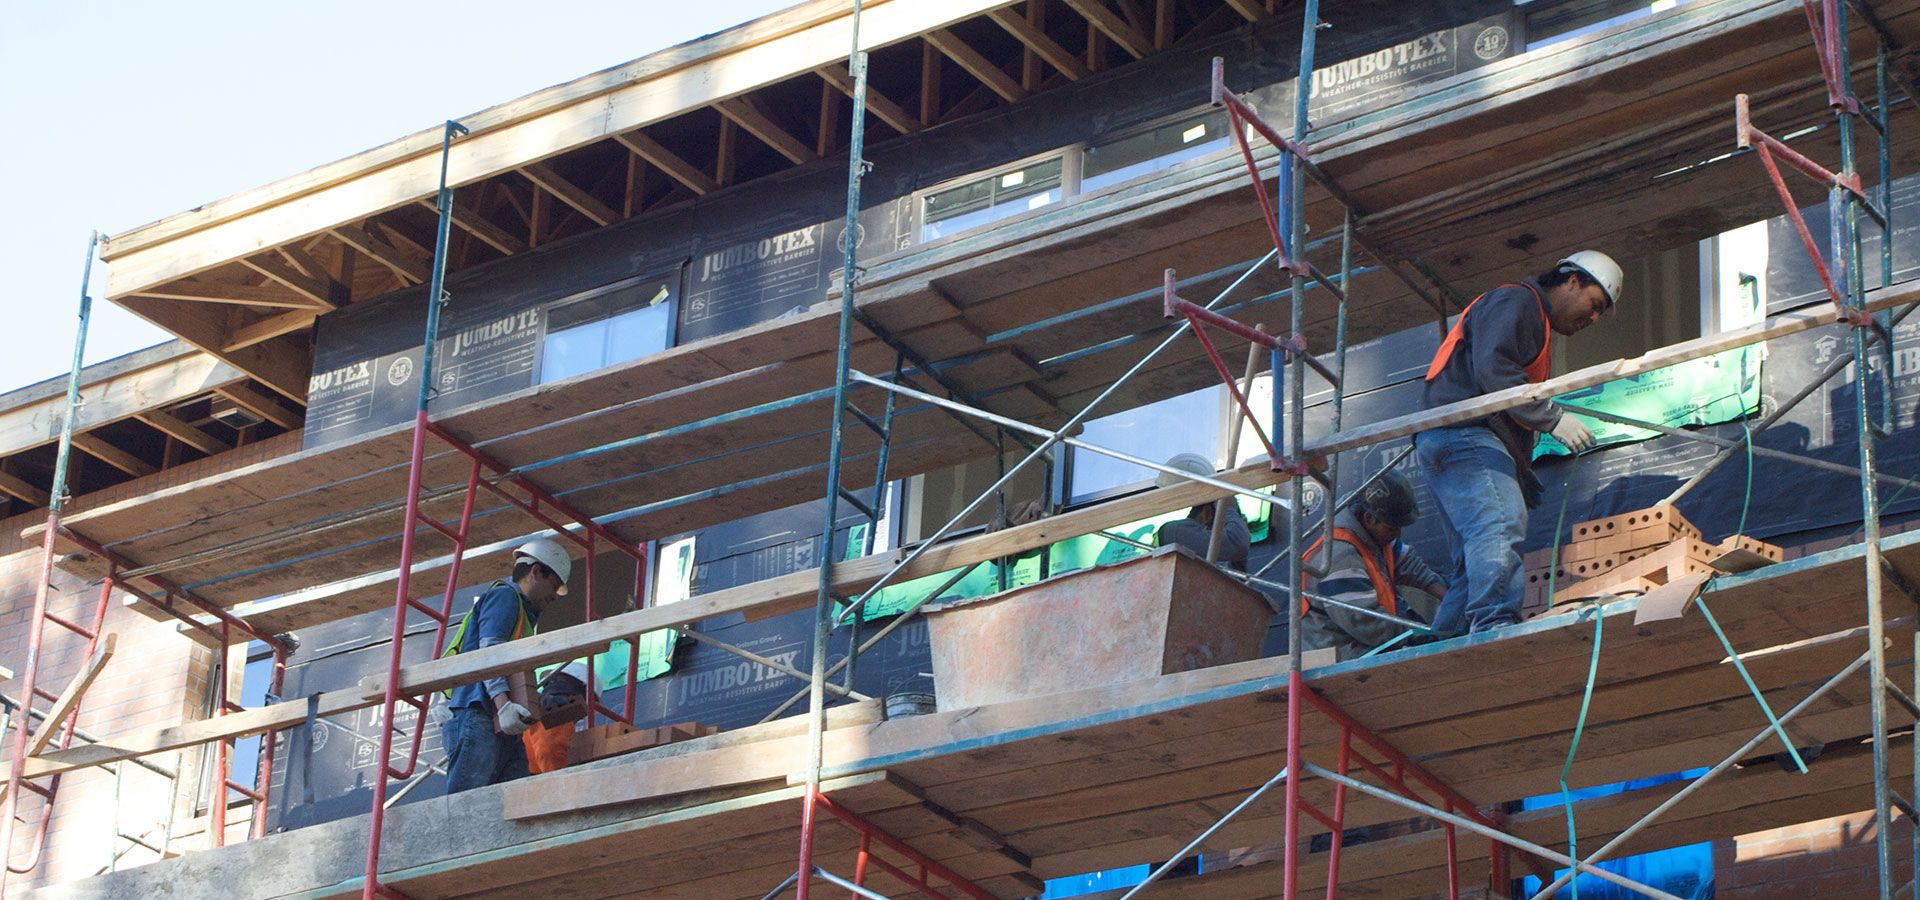 La construction de logements neufs progresse moins vite au for Construction logement neuf